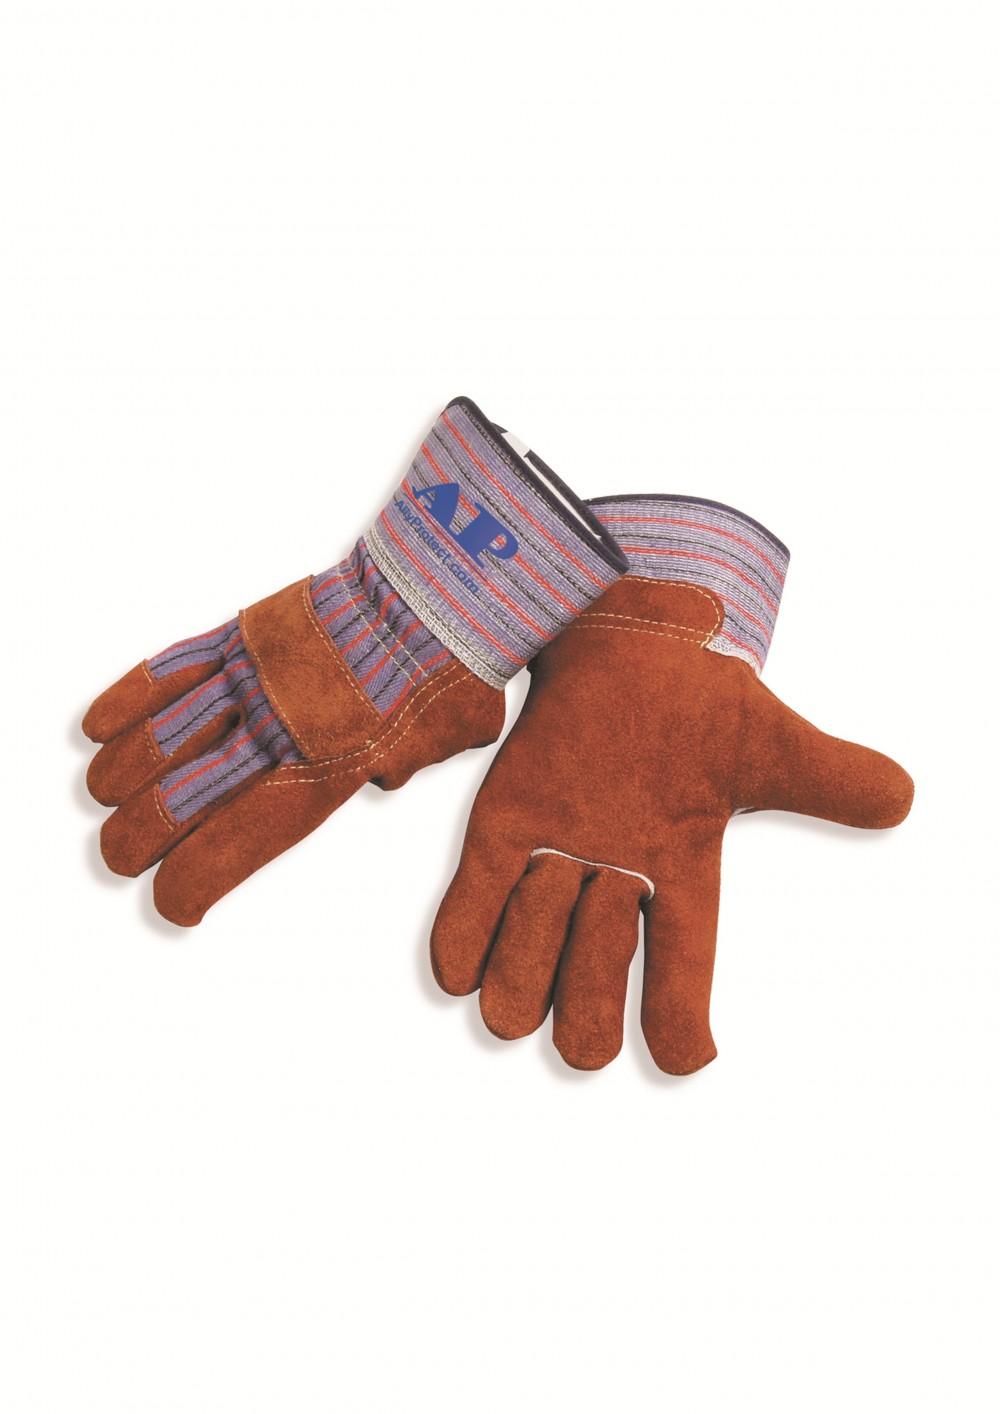 AP-2206友盟咖啡色全掌半皮工作手套